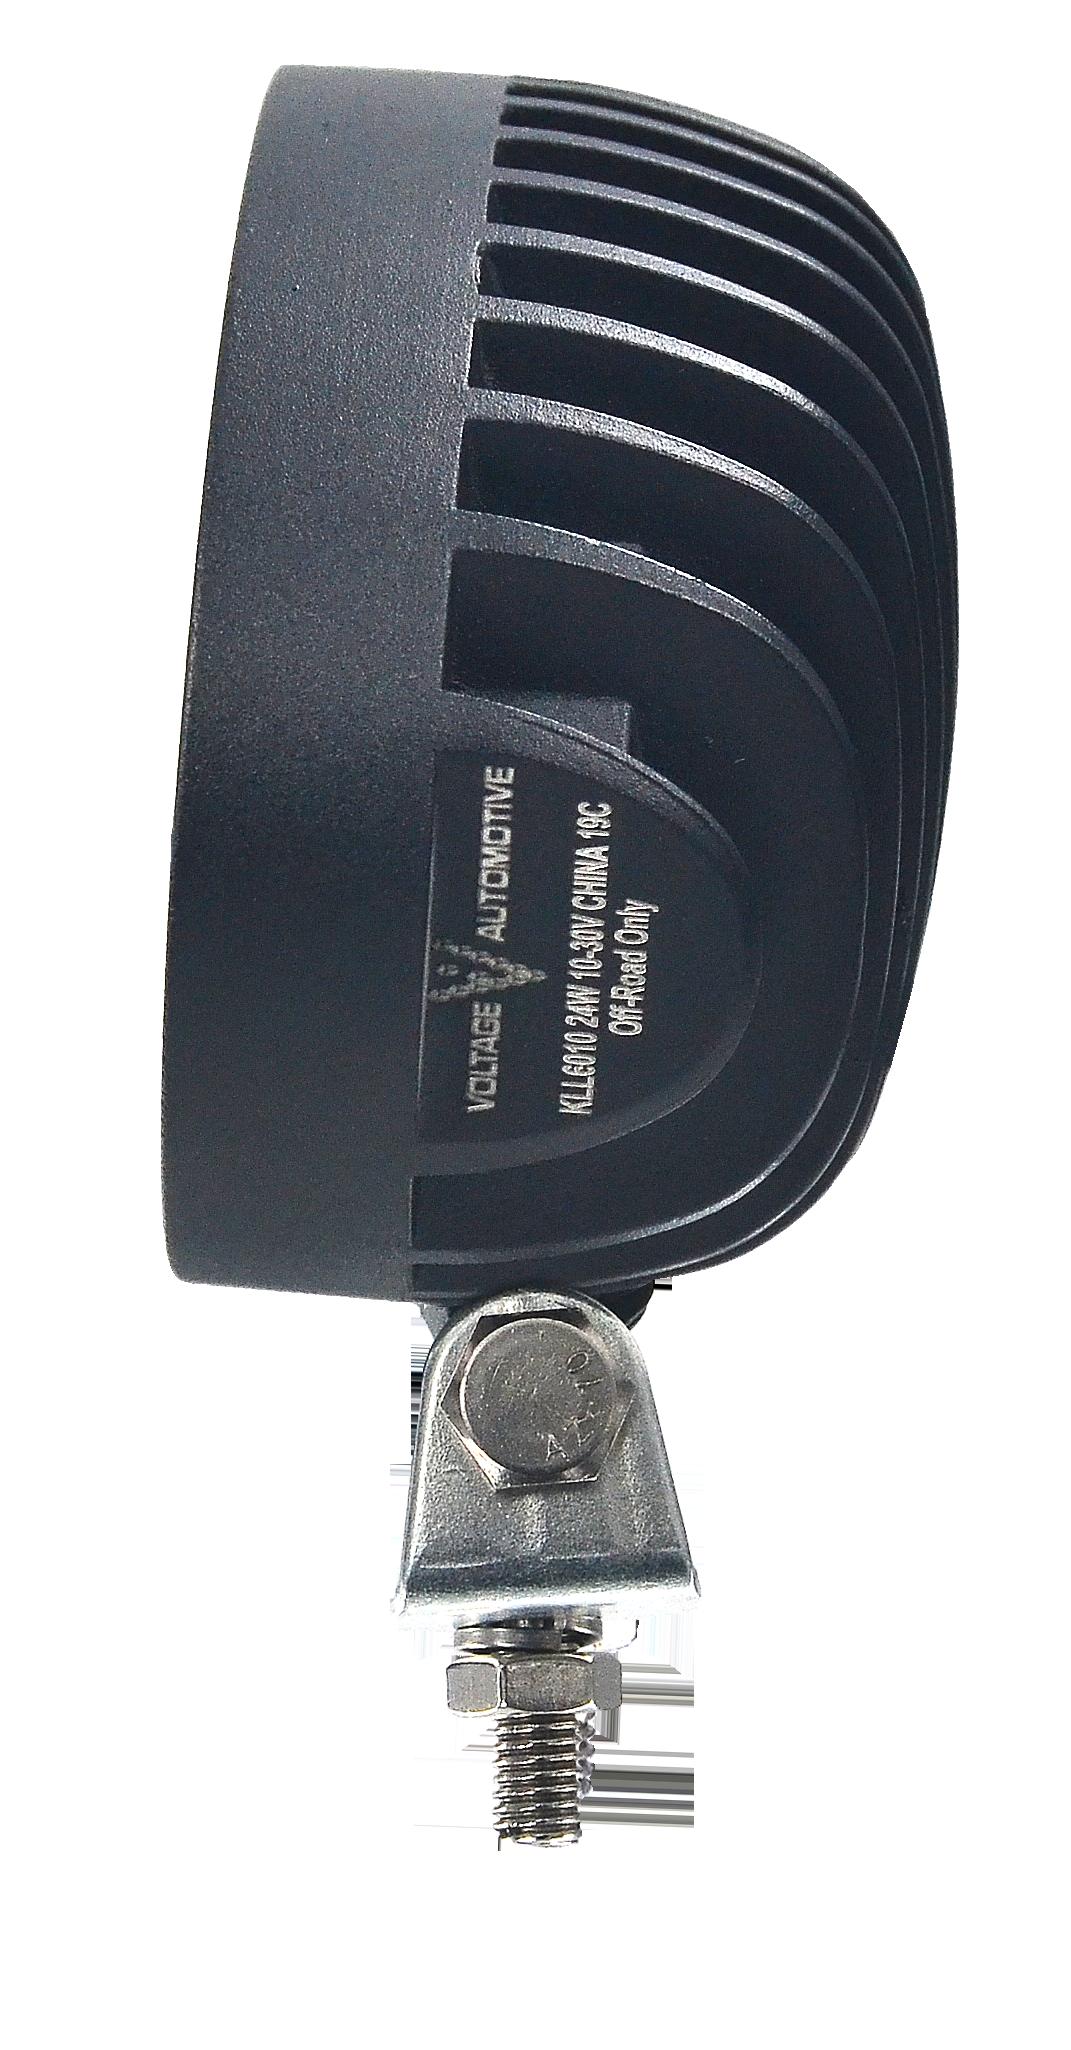 04KLL6010 Voltage Automotive 24W Oval LED Work Light